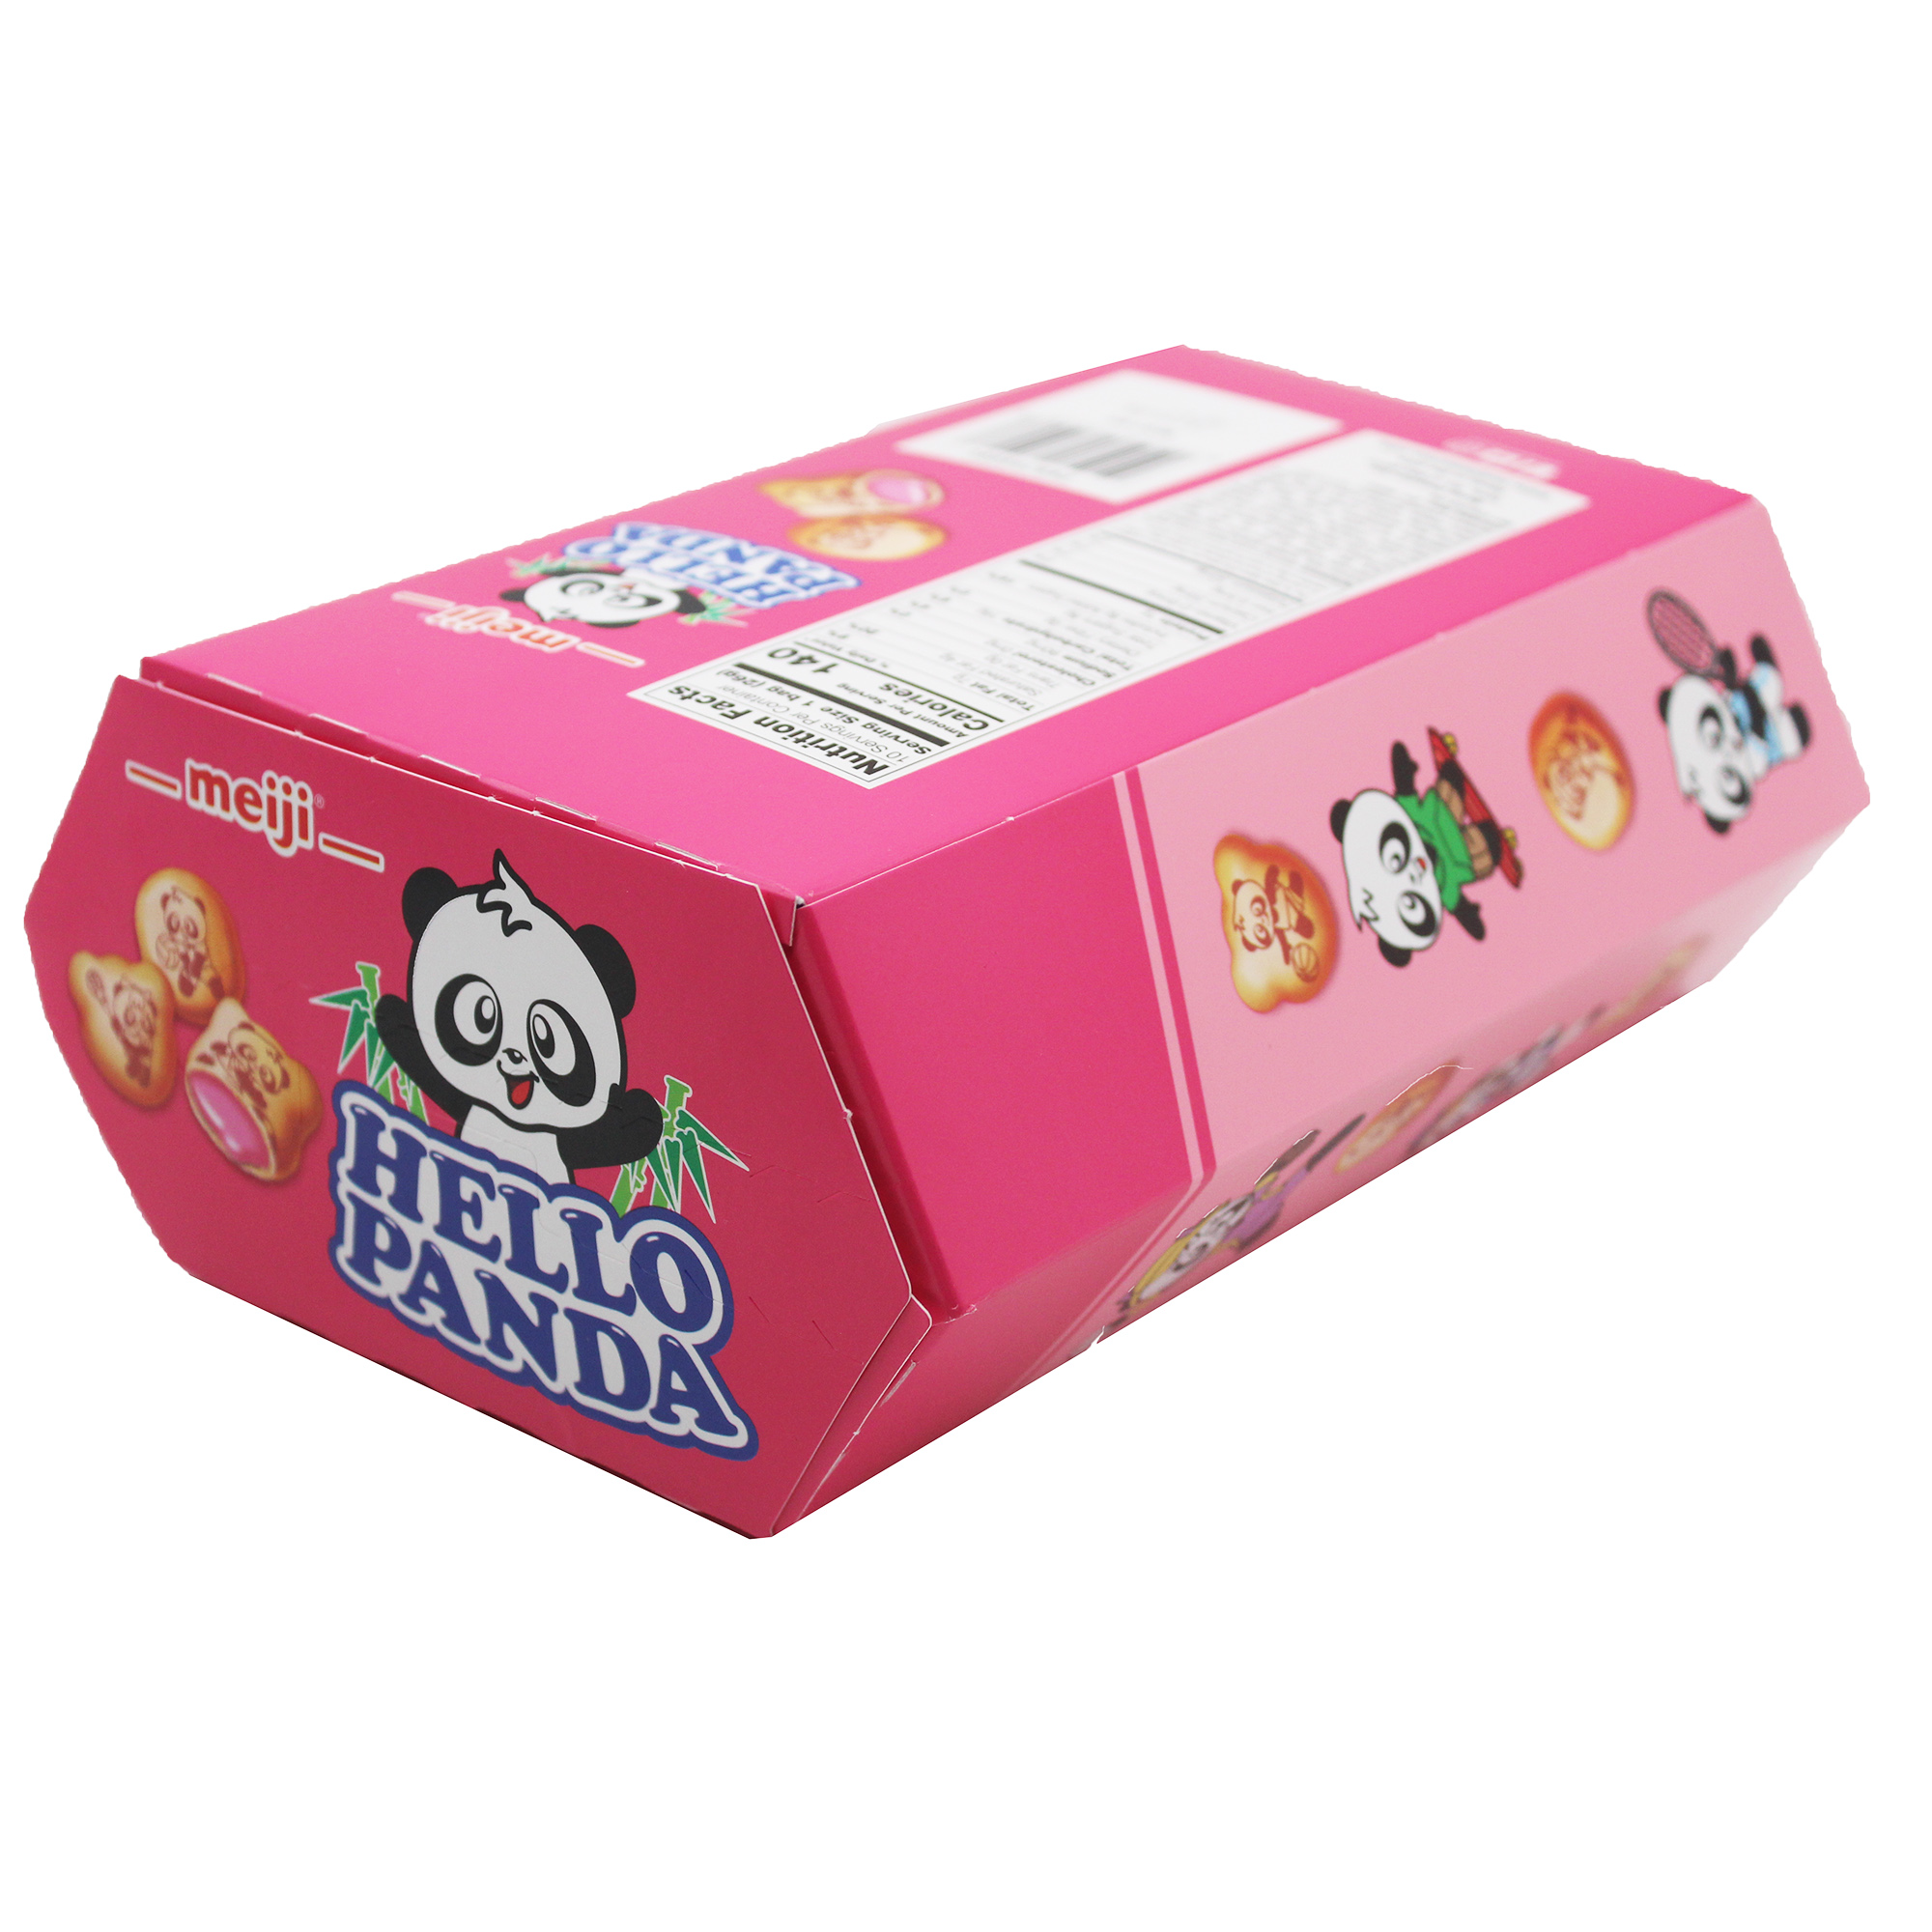 medium meiji hello panda strawberry cookies 10 bags x 91 oz mJQhyDHRhR